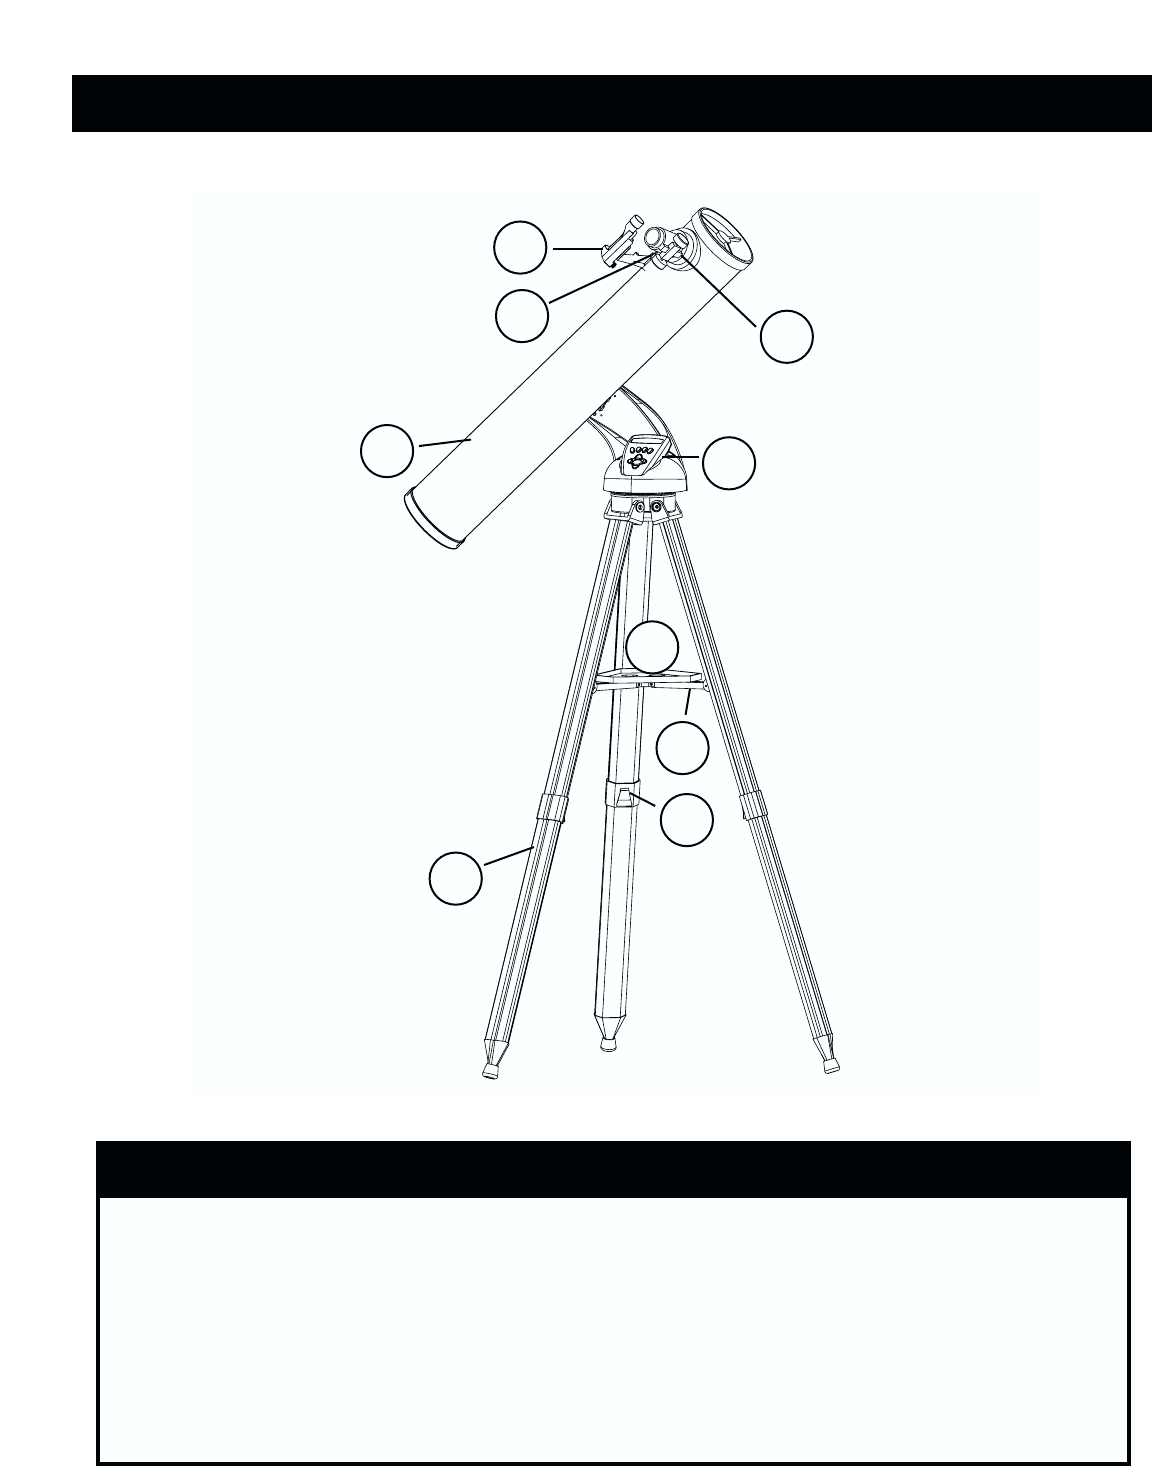 Bushnell 78-8831, 78-8846 TELESCOPE PARTS DIAGRAM